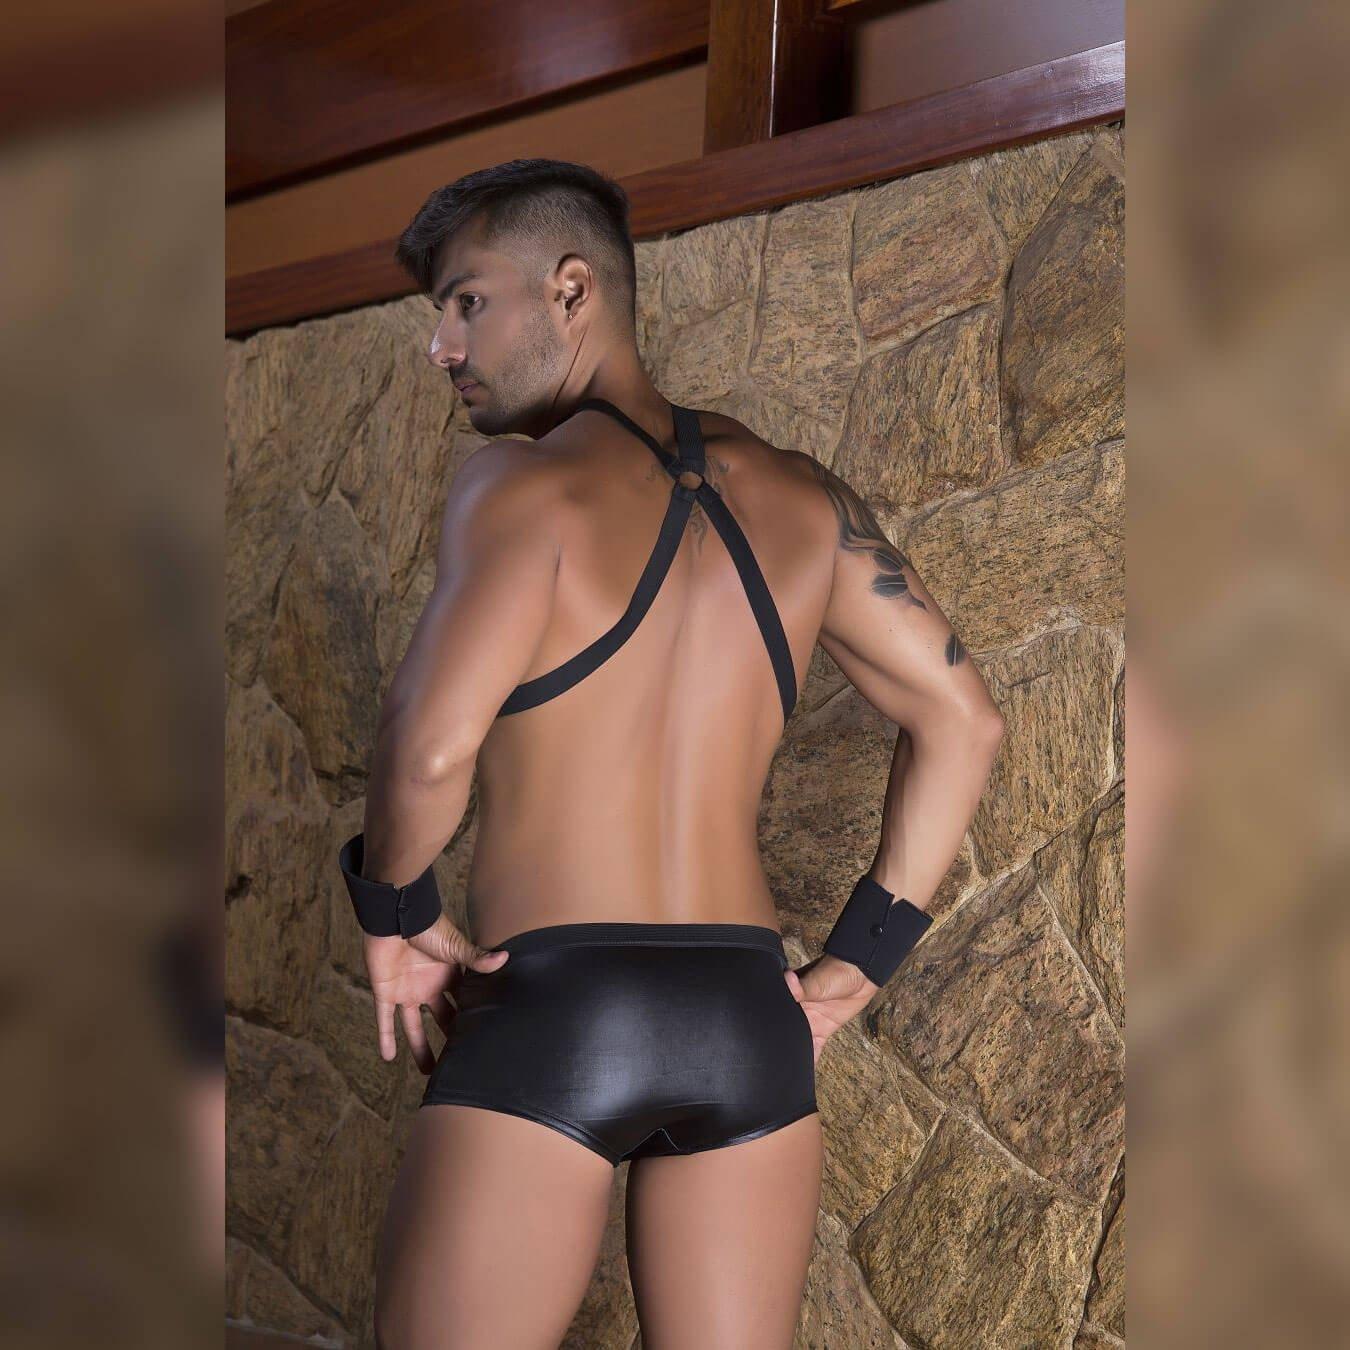 Fantasia Masculina de segurança - Garota veneno  - Sex Shop Cuiaba - Sexshop - Sexyshop - Produtos Eróticos